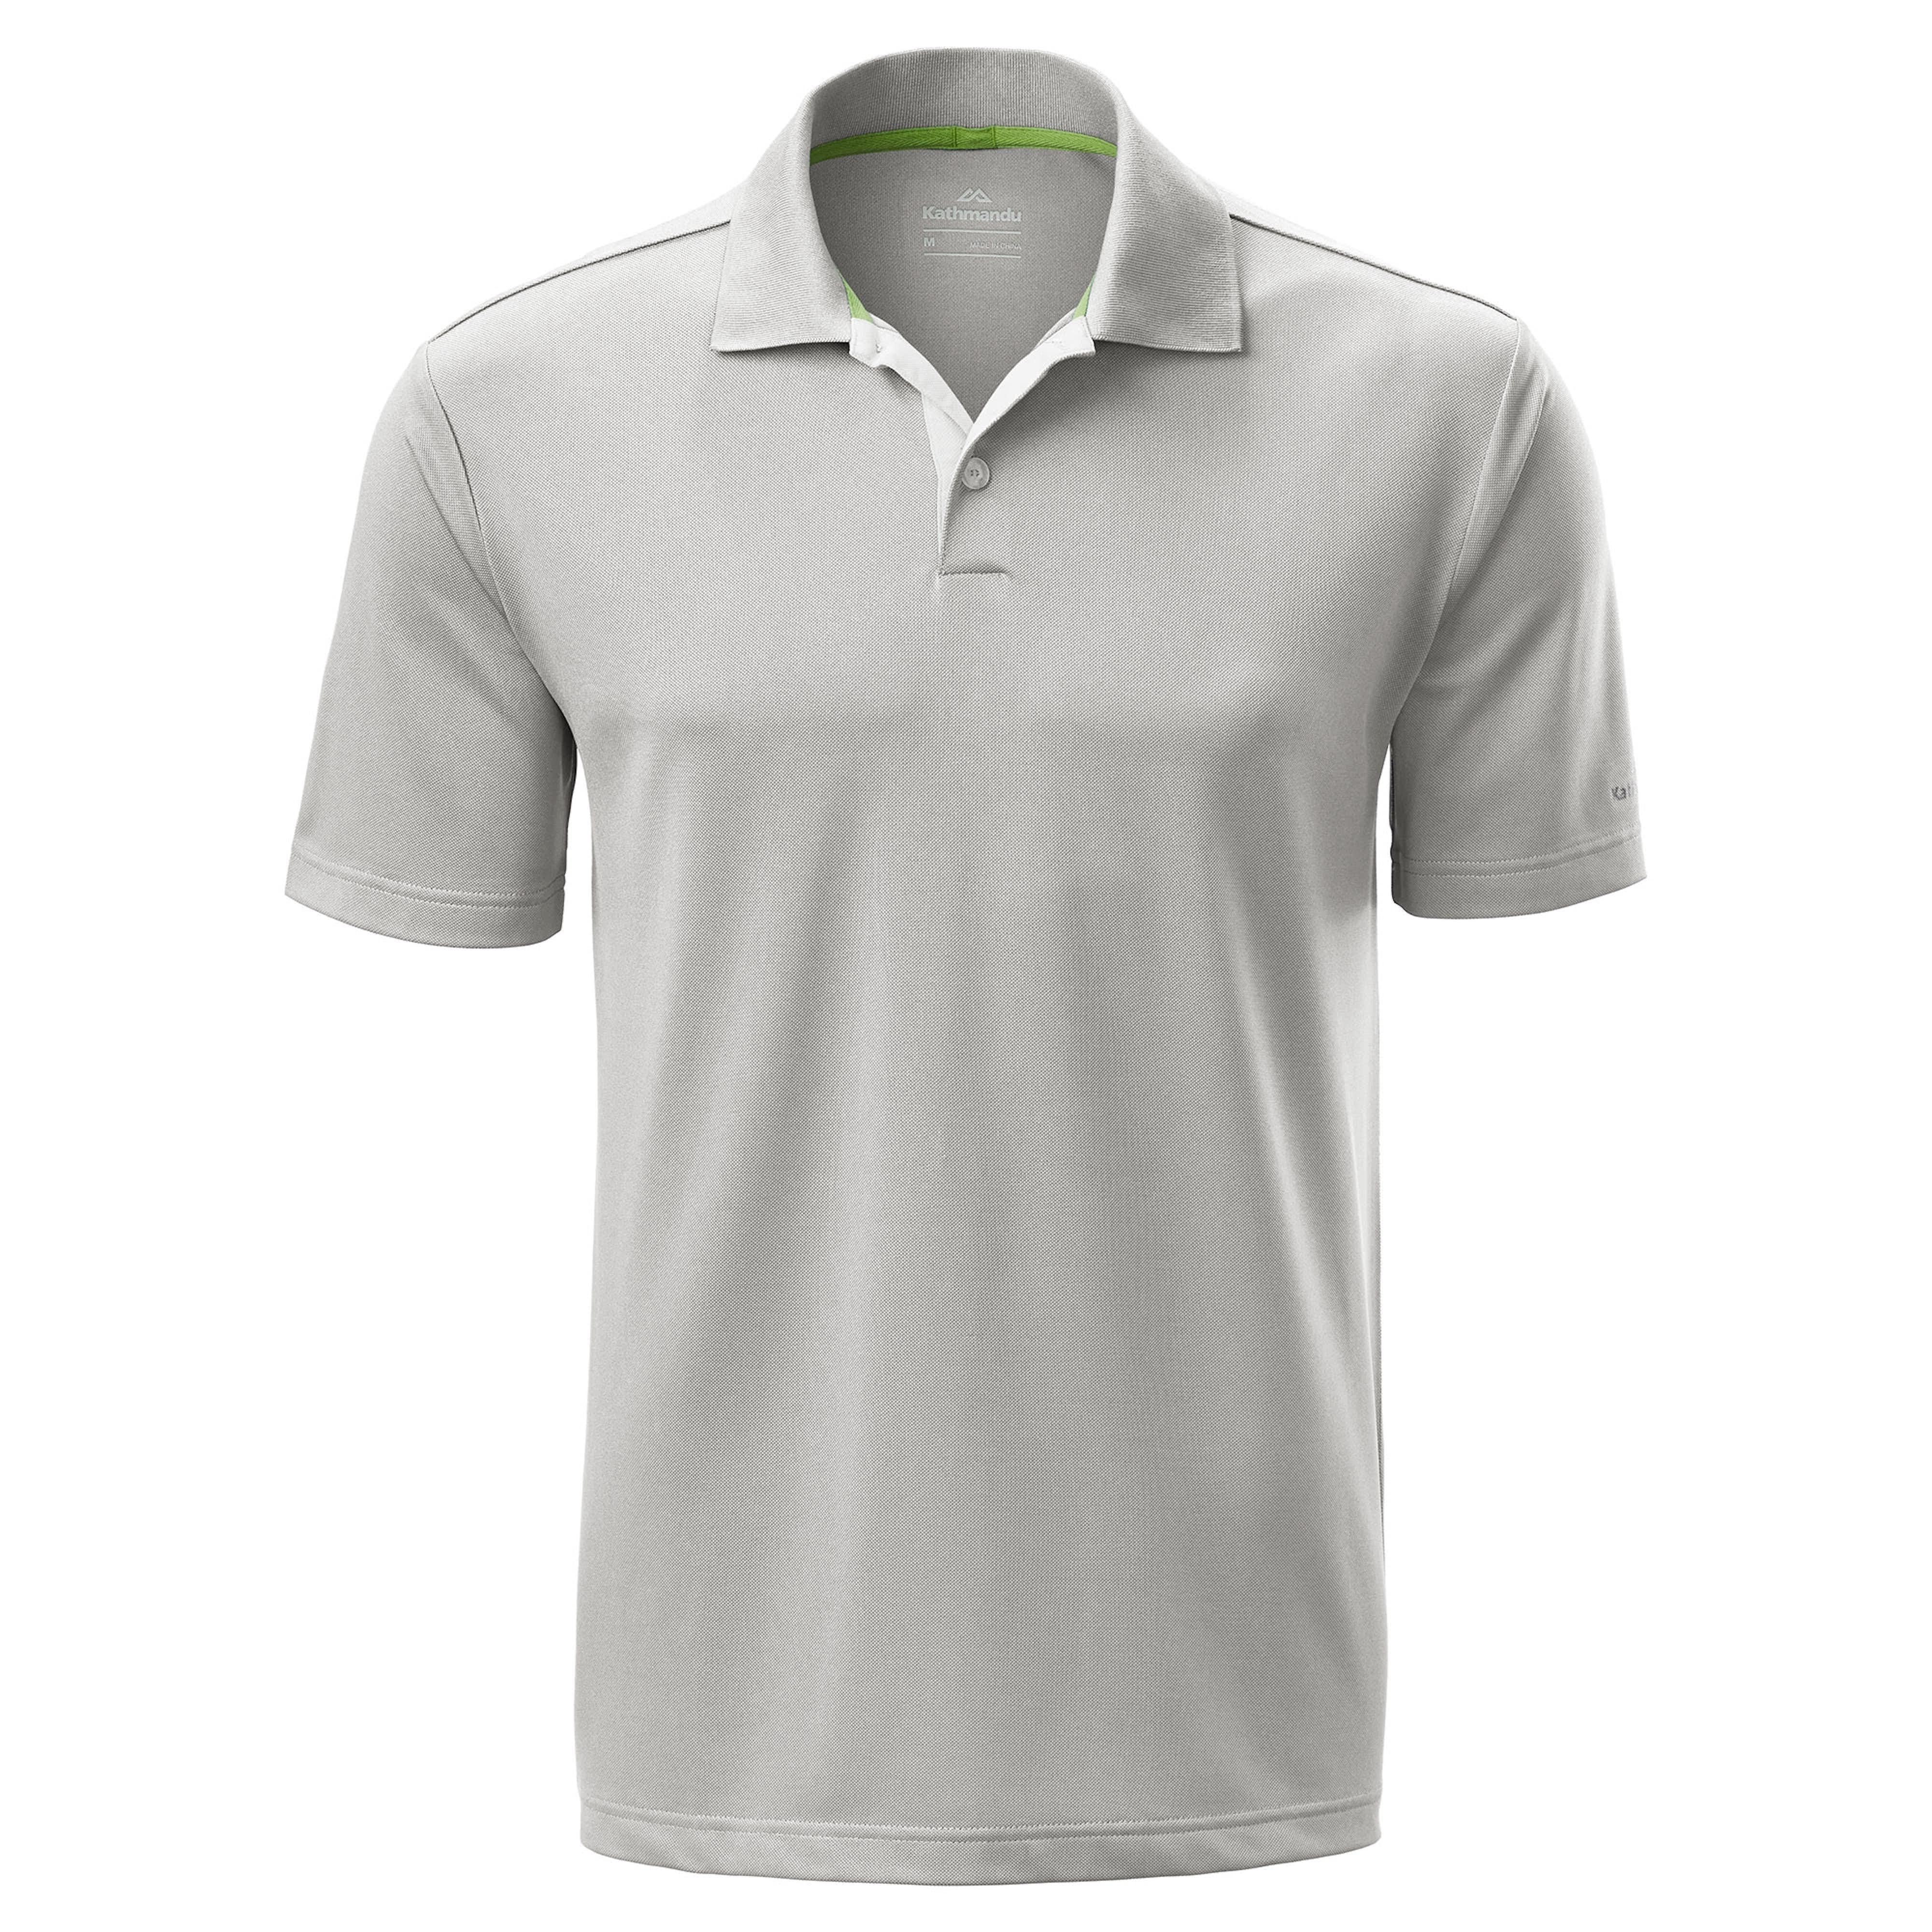 0ac228227 Vanua Men's Short Sleeve Polo Shirt v2 - Red